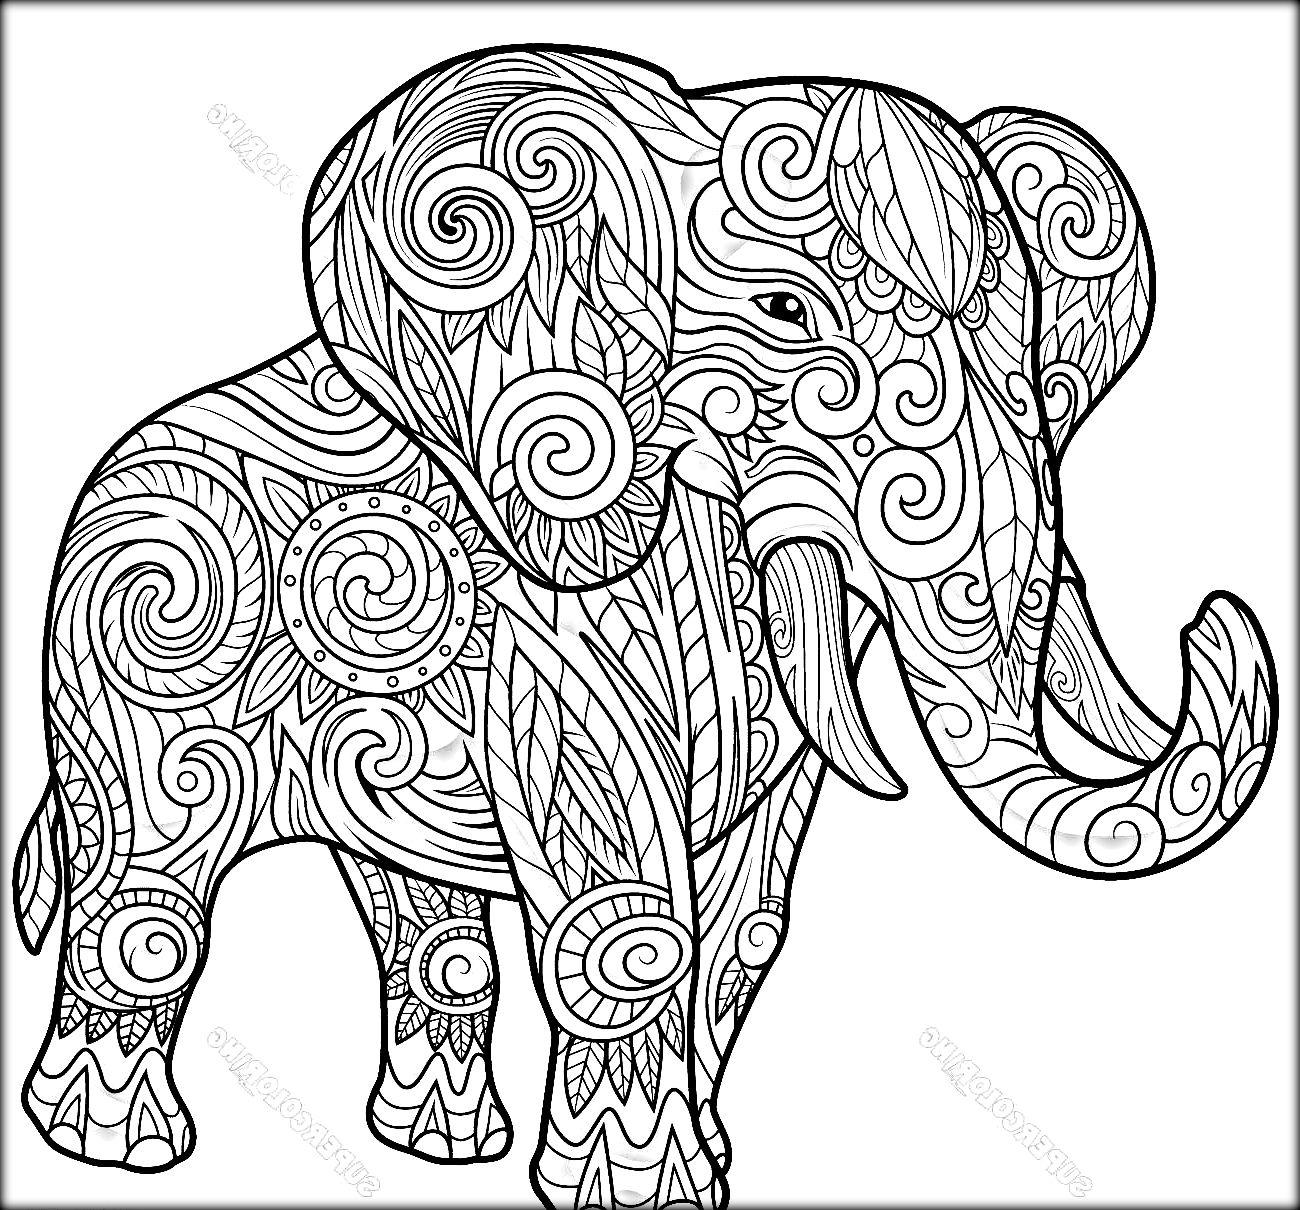 Free Mandala Coloring Pages Animals at GetDrawings | Free ...